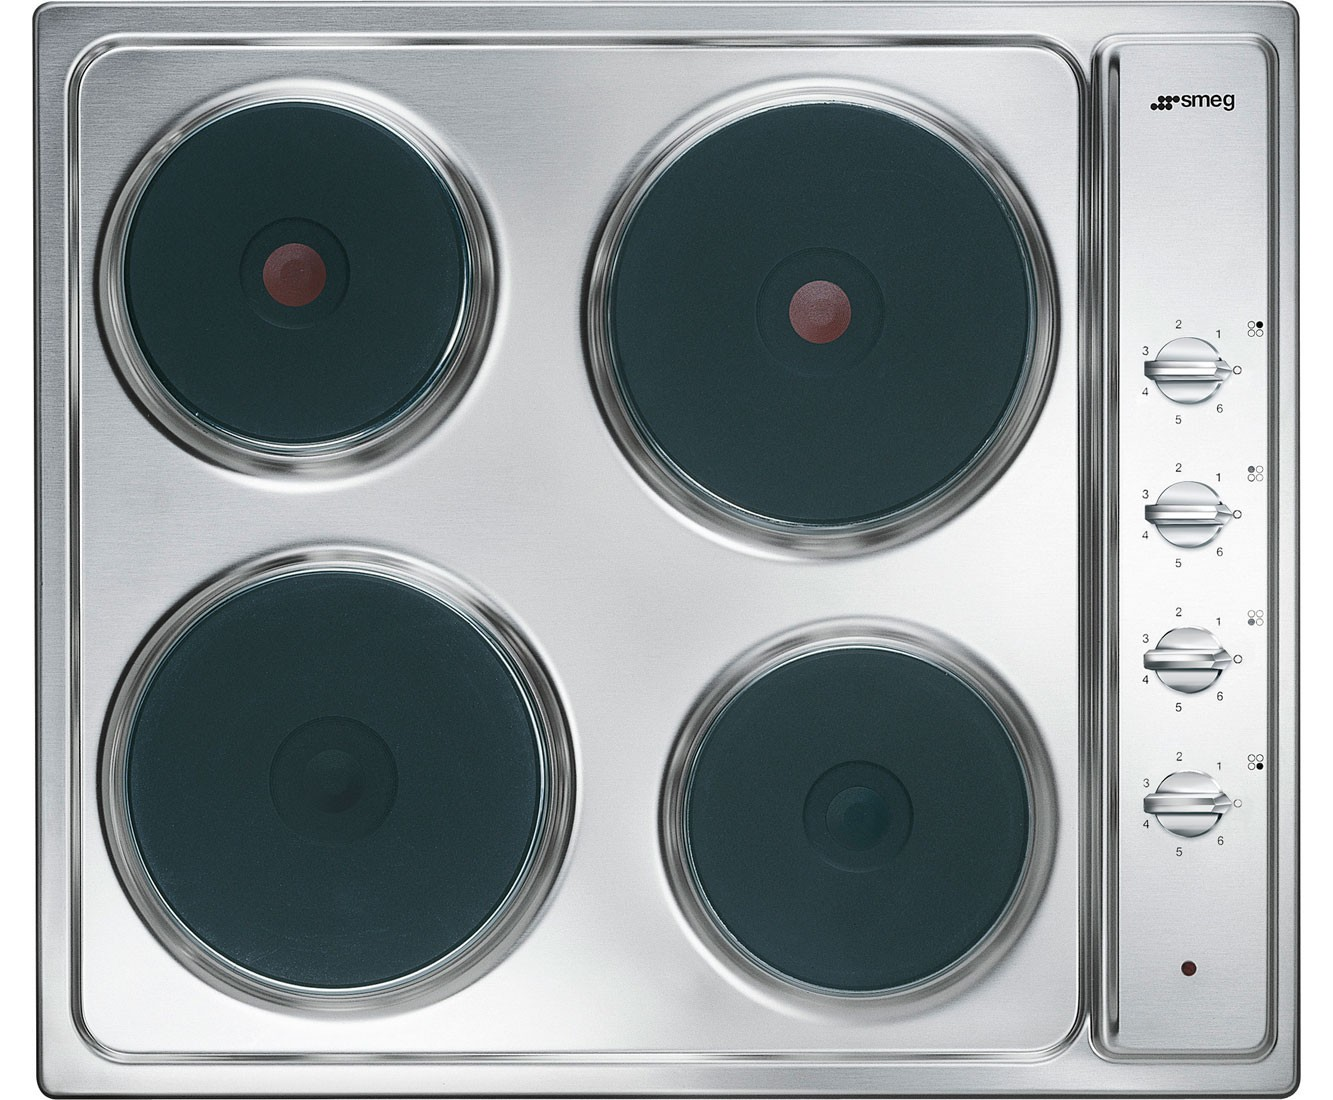 smeg elektro kochfeld se435s edelstahl 60 cm fab appliances